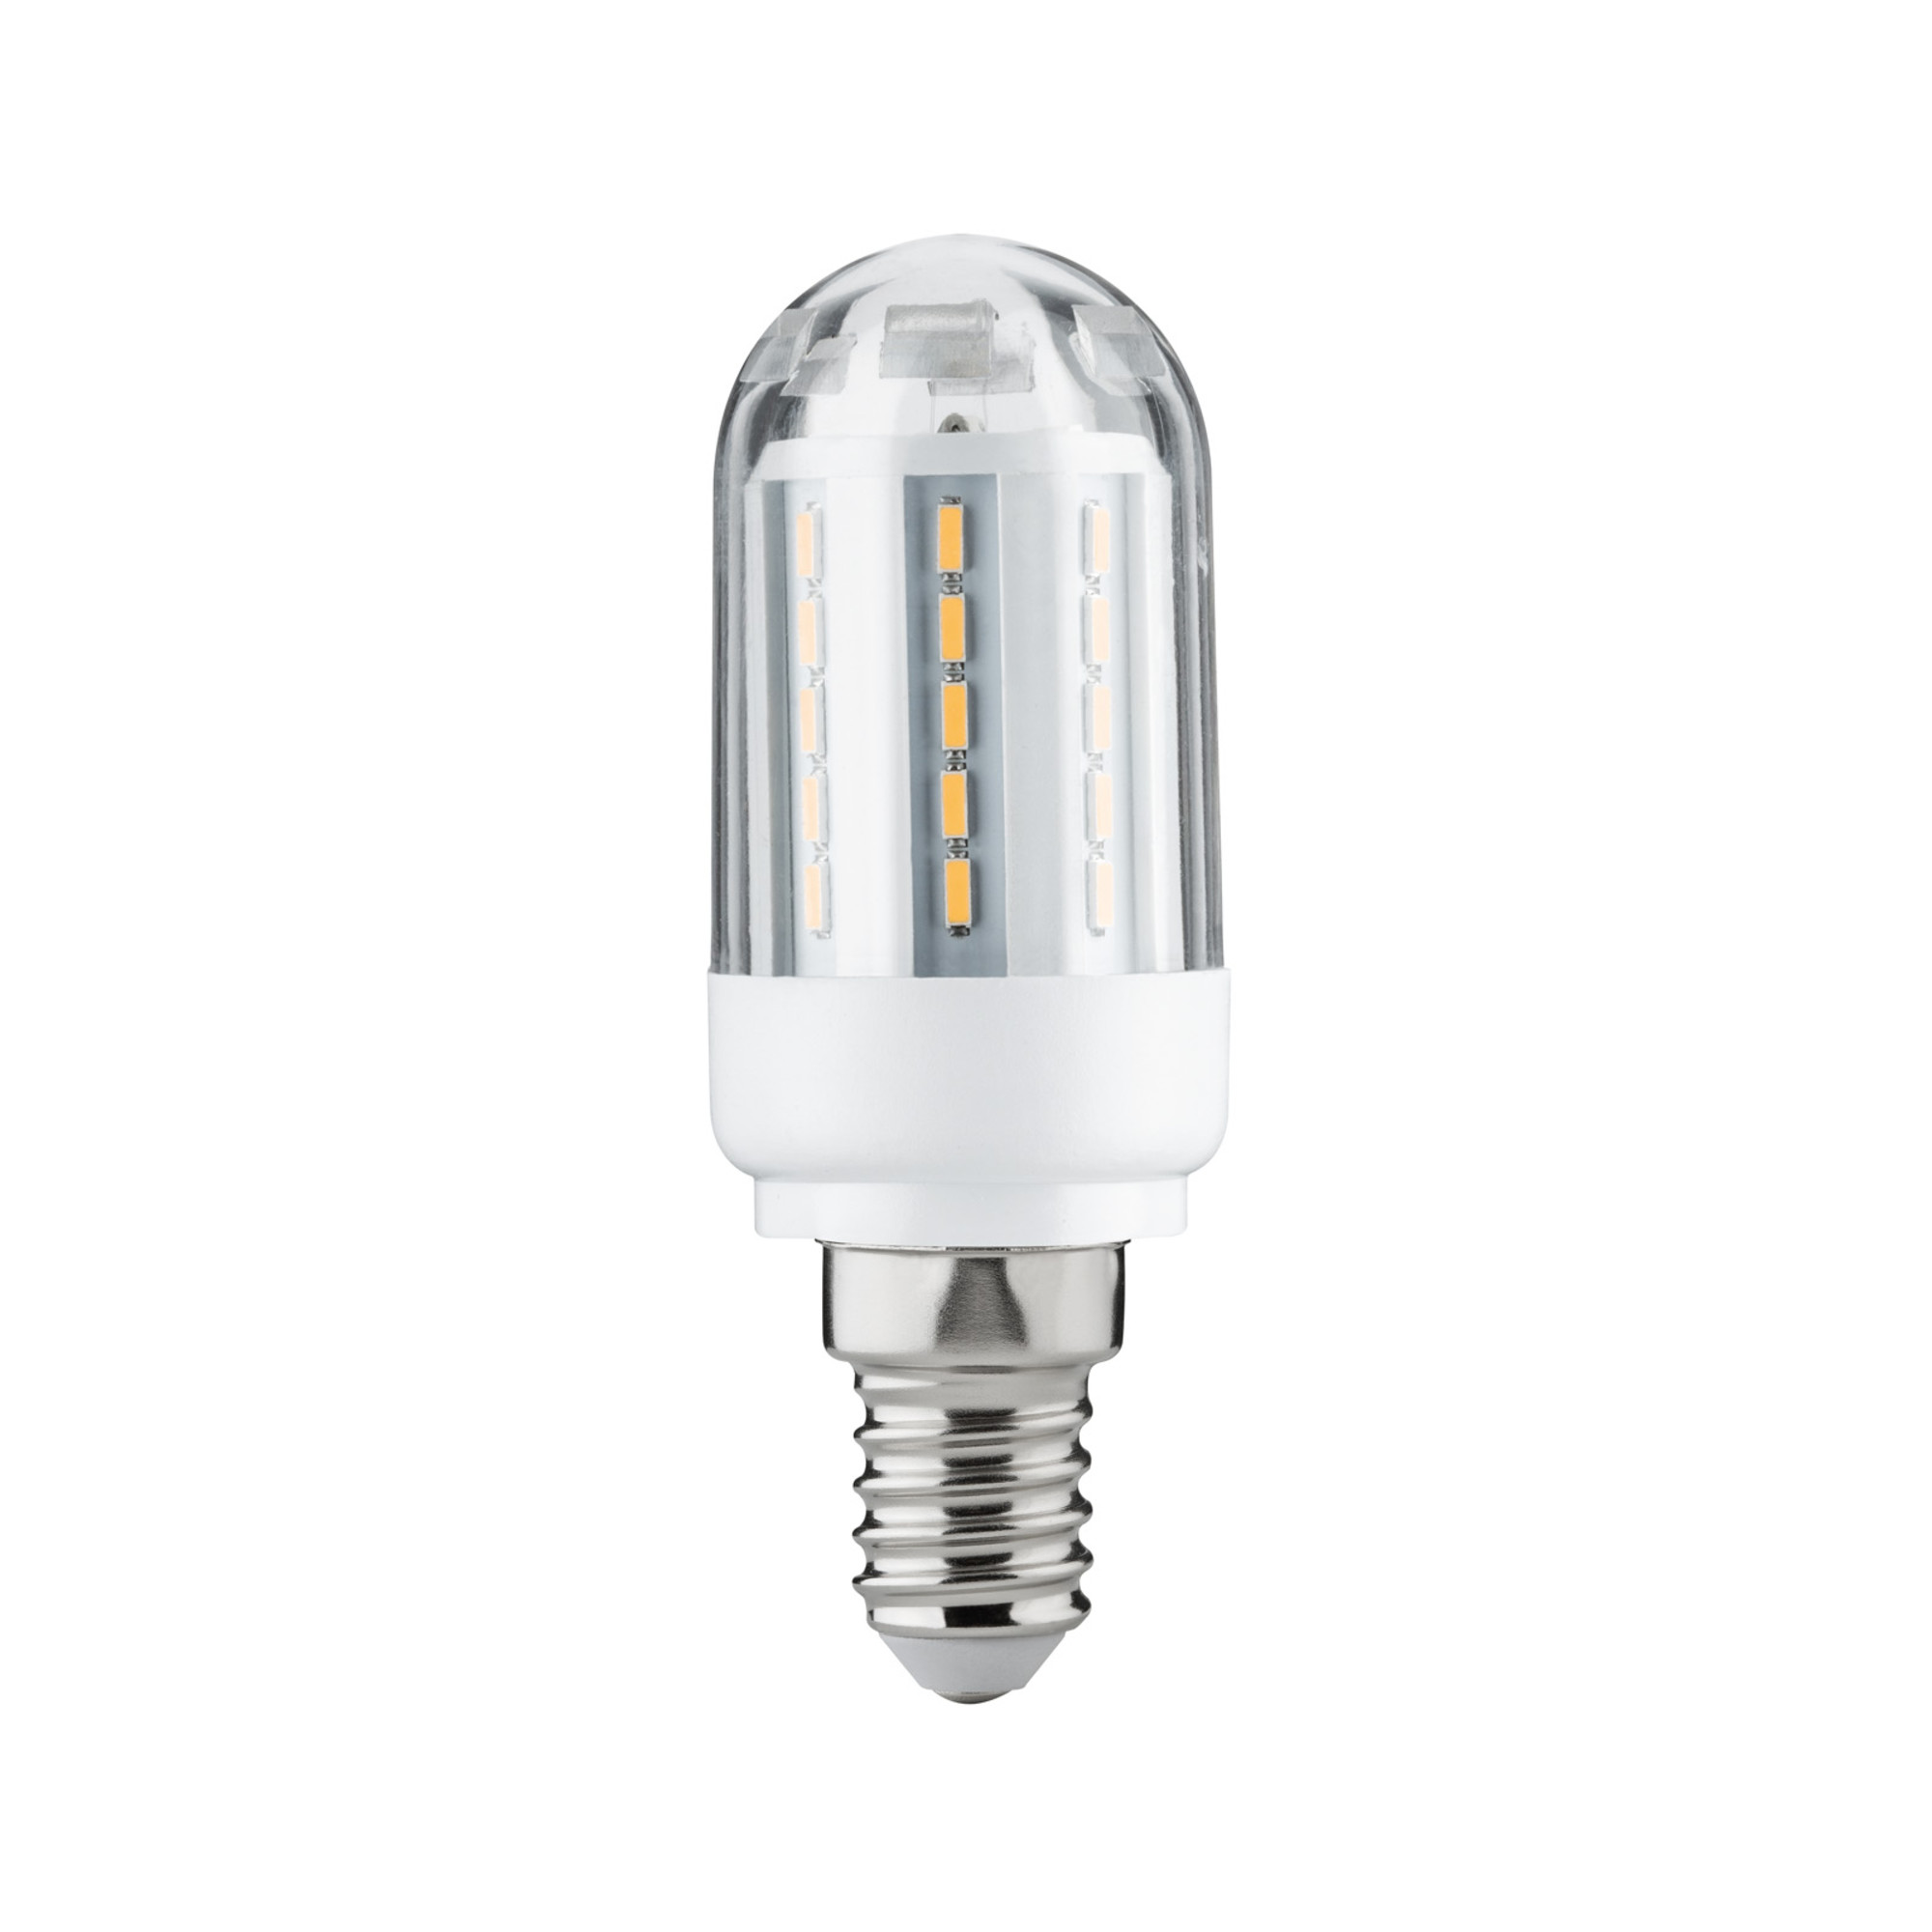 Лампа светодиодная Paulmann Кукуруза 3.5Вт 340лм 2700K E14 230В Прозрачный 28413.